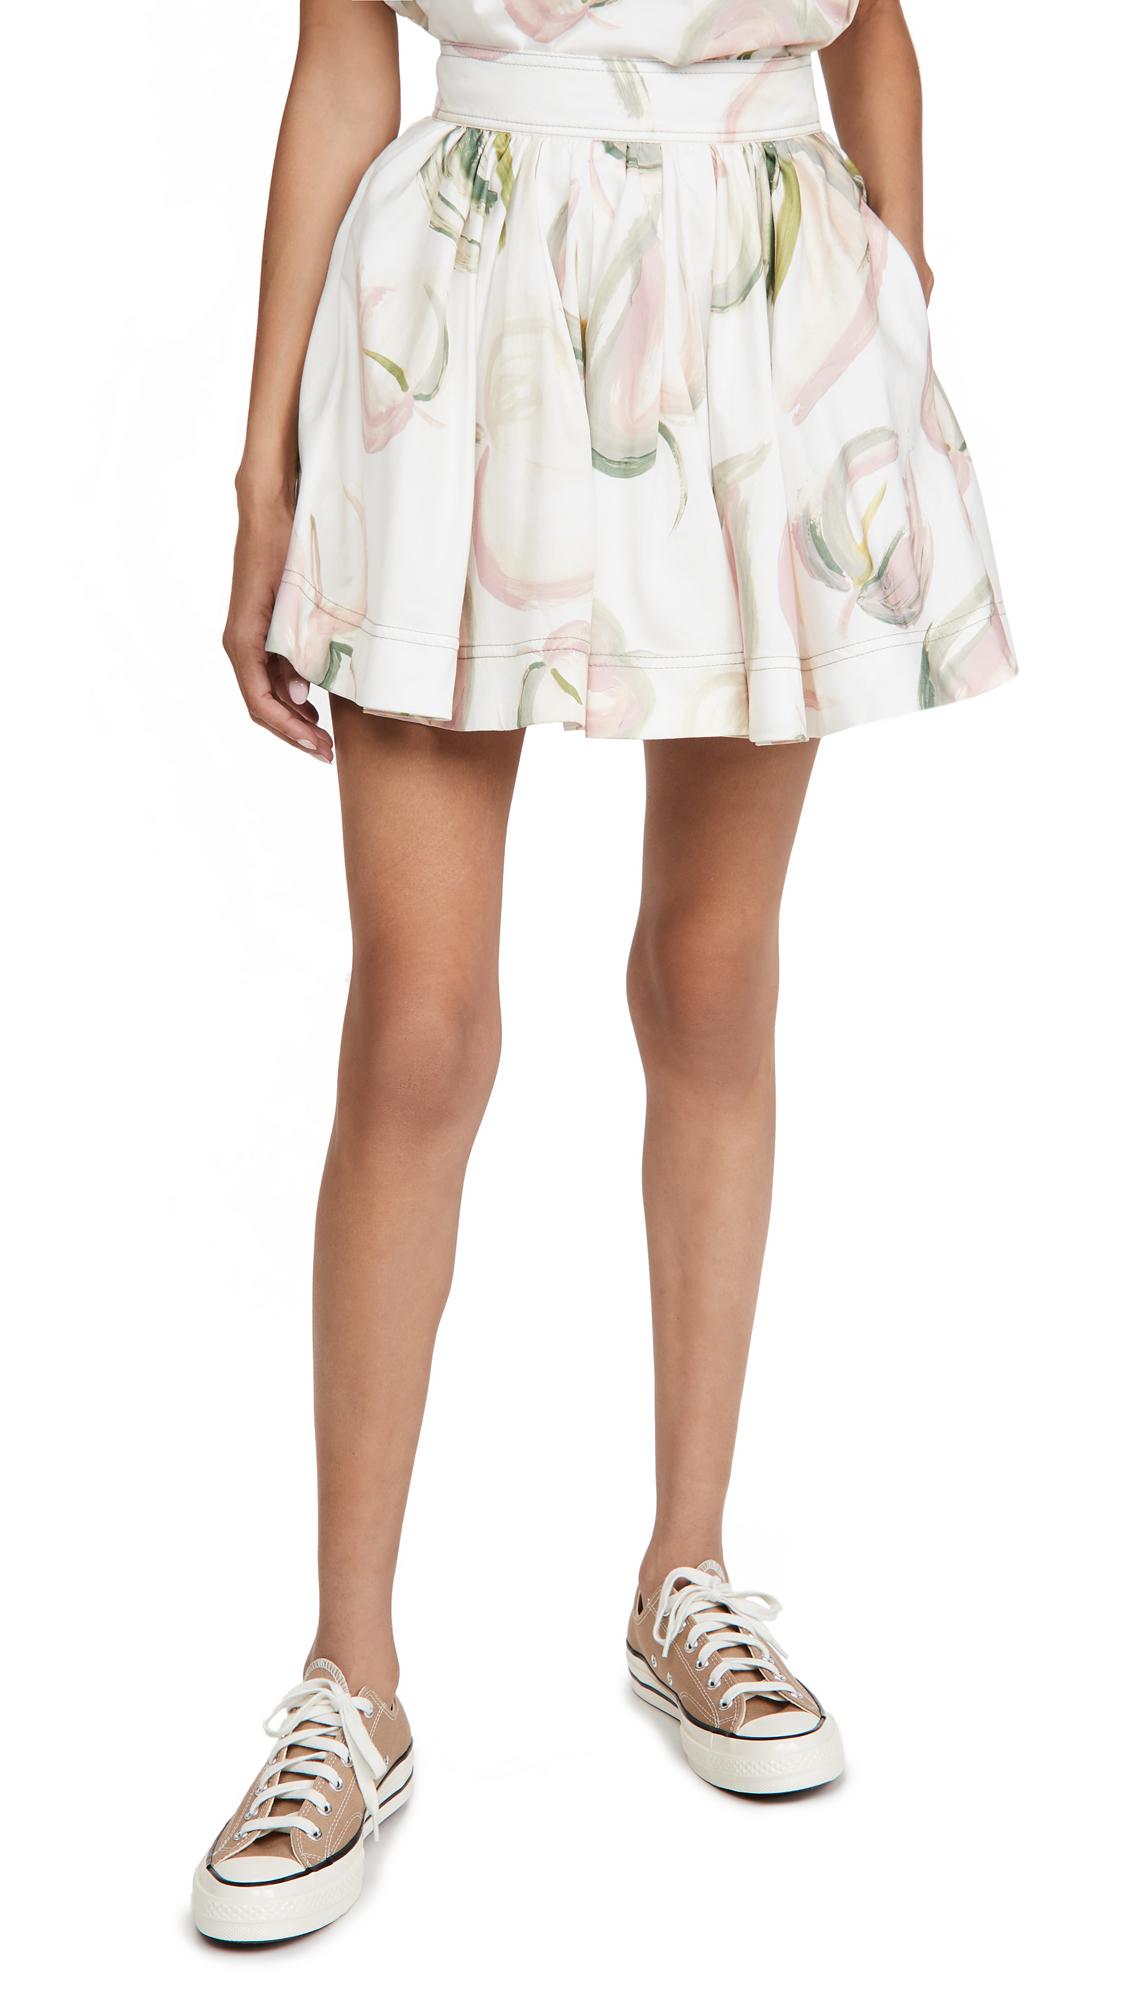 Aje Imprint Mini Skirt